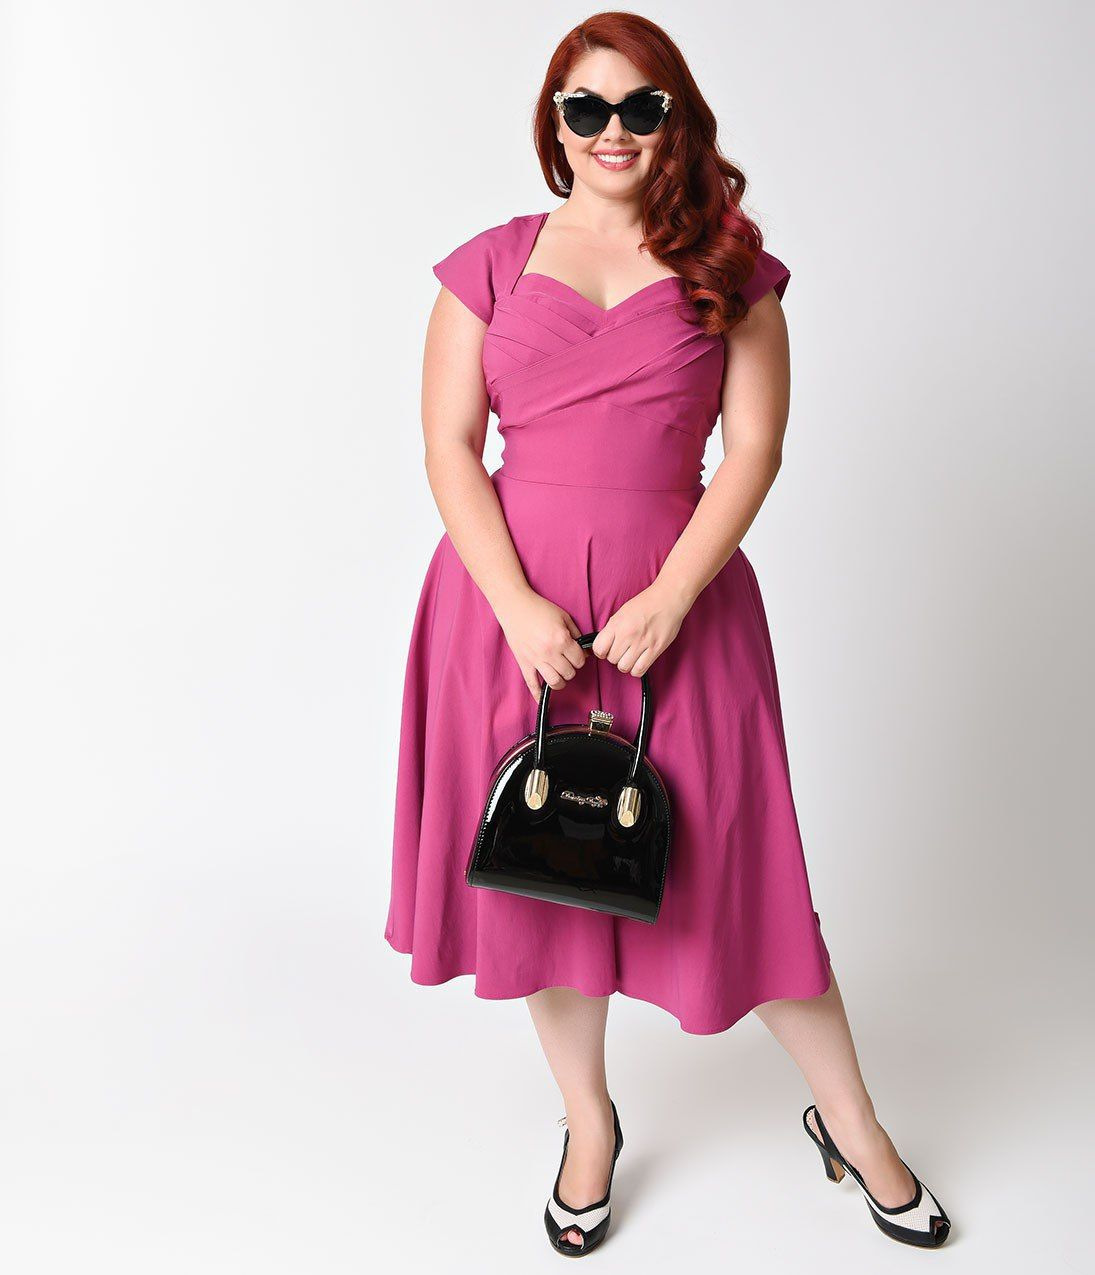 Modelos para hacer un vestido – Moda Española moderna